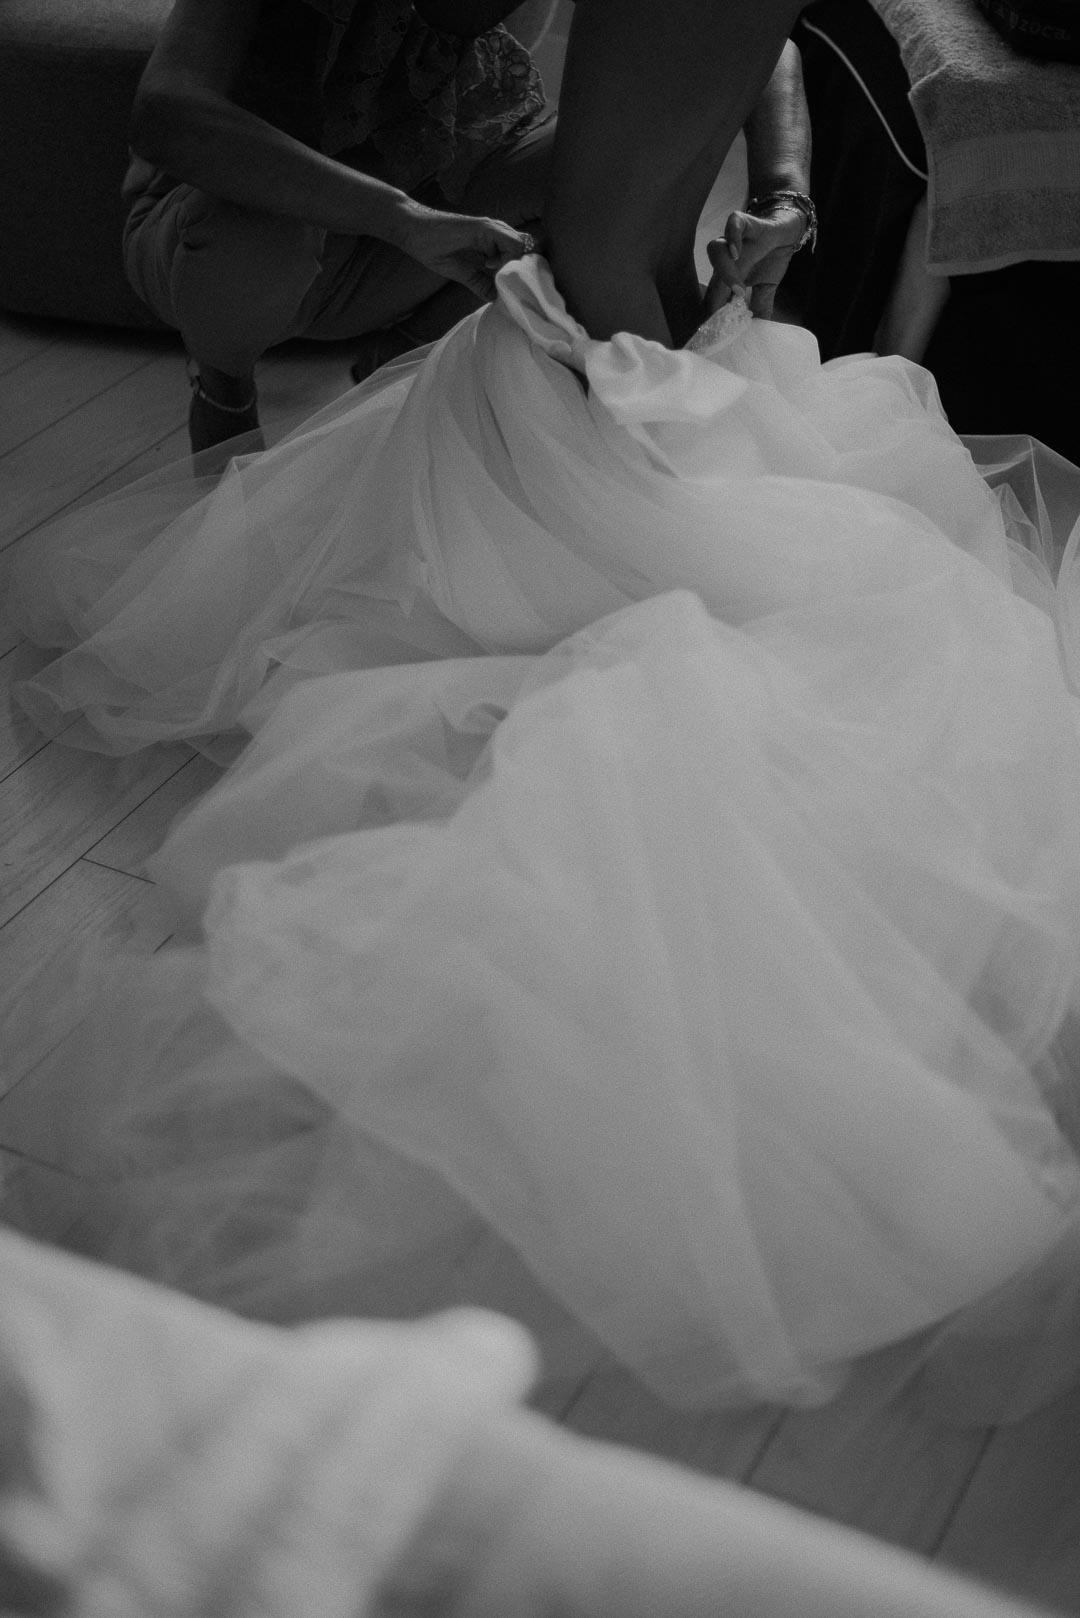 wedding-photographer-destination-fineart-bespoke-reportage-napoli-nabilah-vivianeizzo-spazio46-38